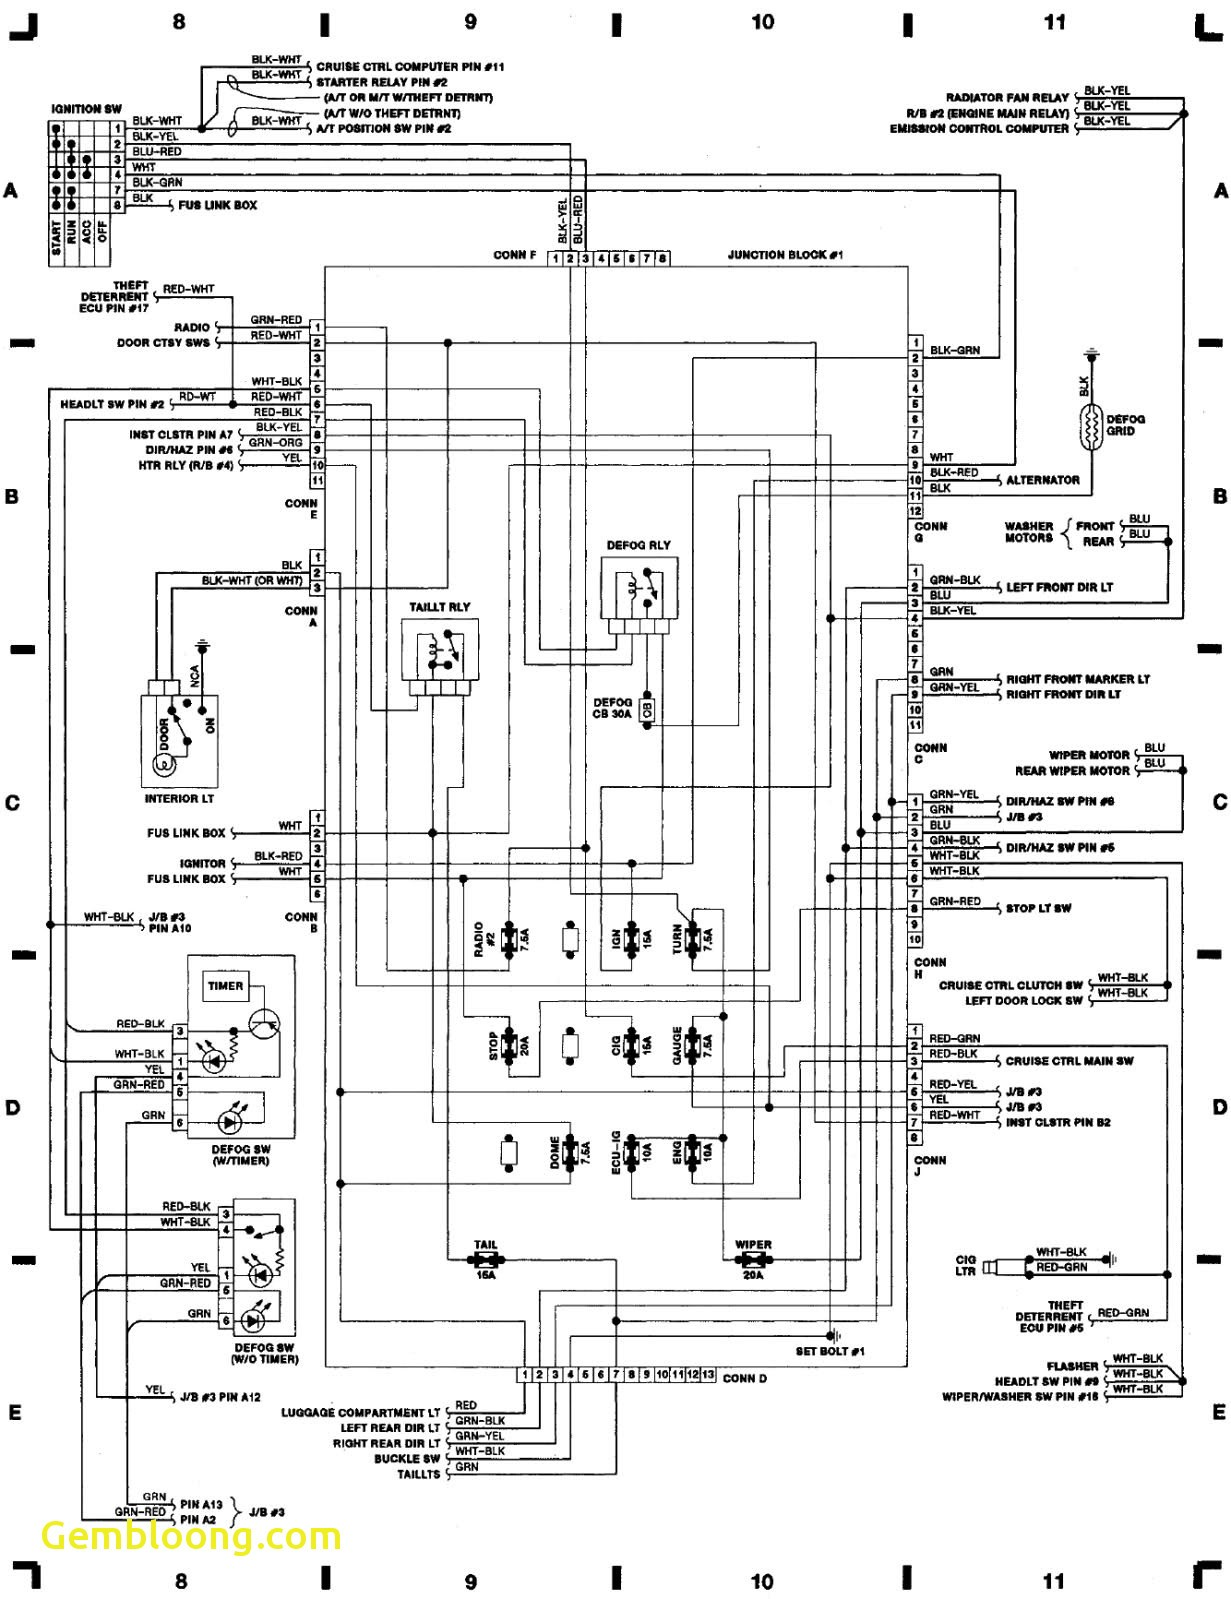 1990 toyota Camry Engine Diagram 2007 Corolla Wiring Diagram Wiring Diagram toolbox Of 1990 toyota Camry Engine Diagram